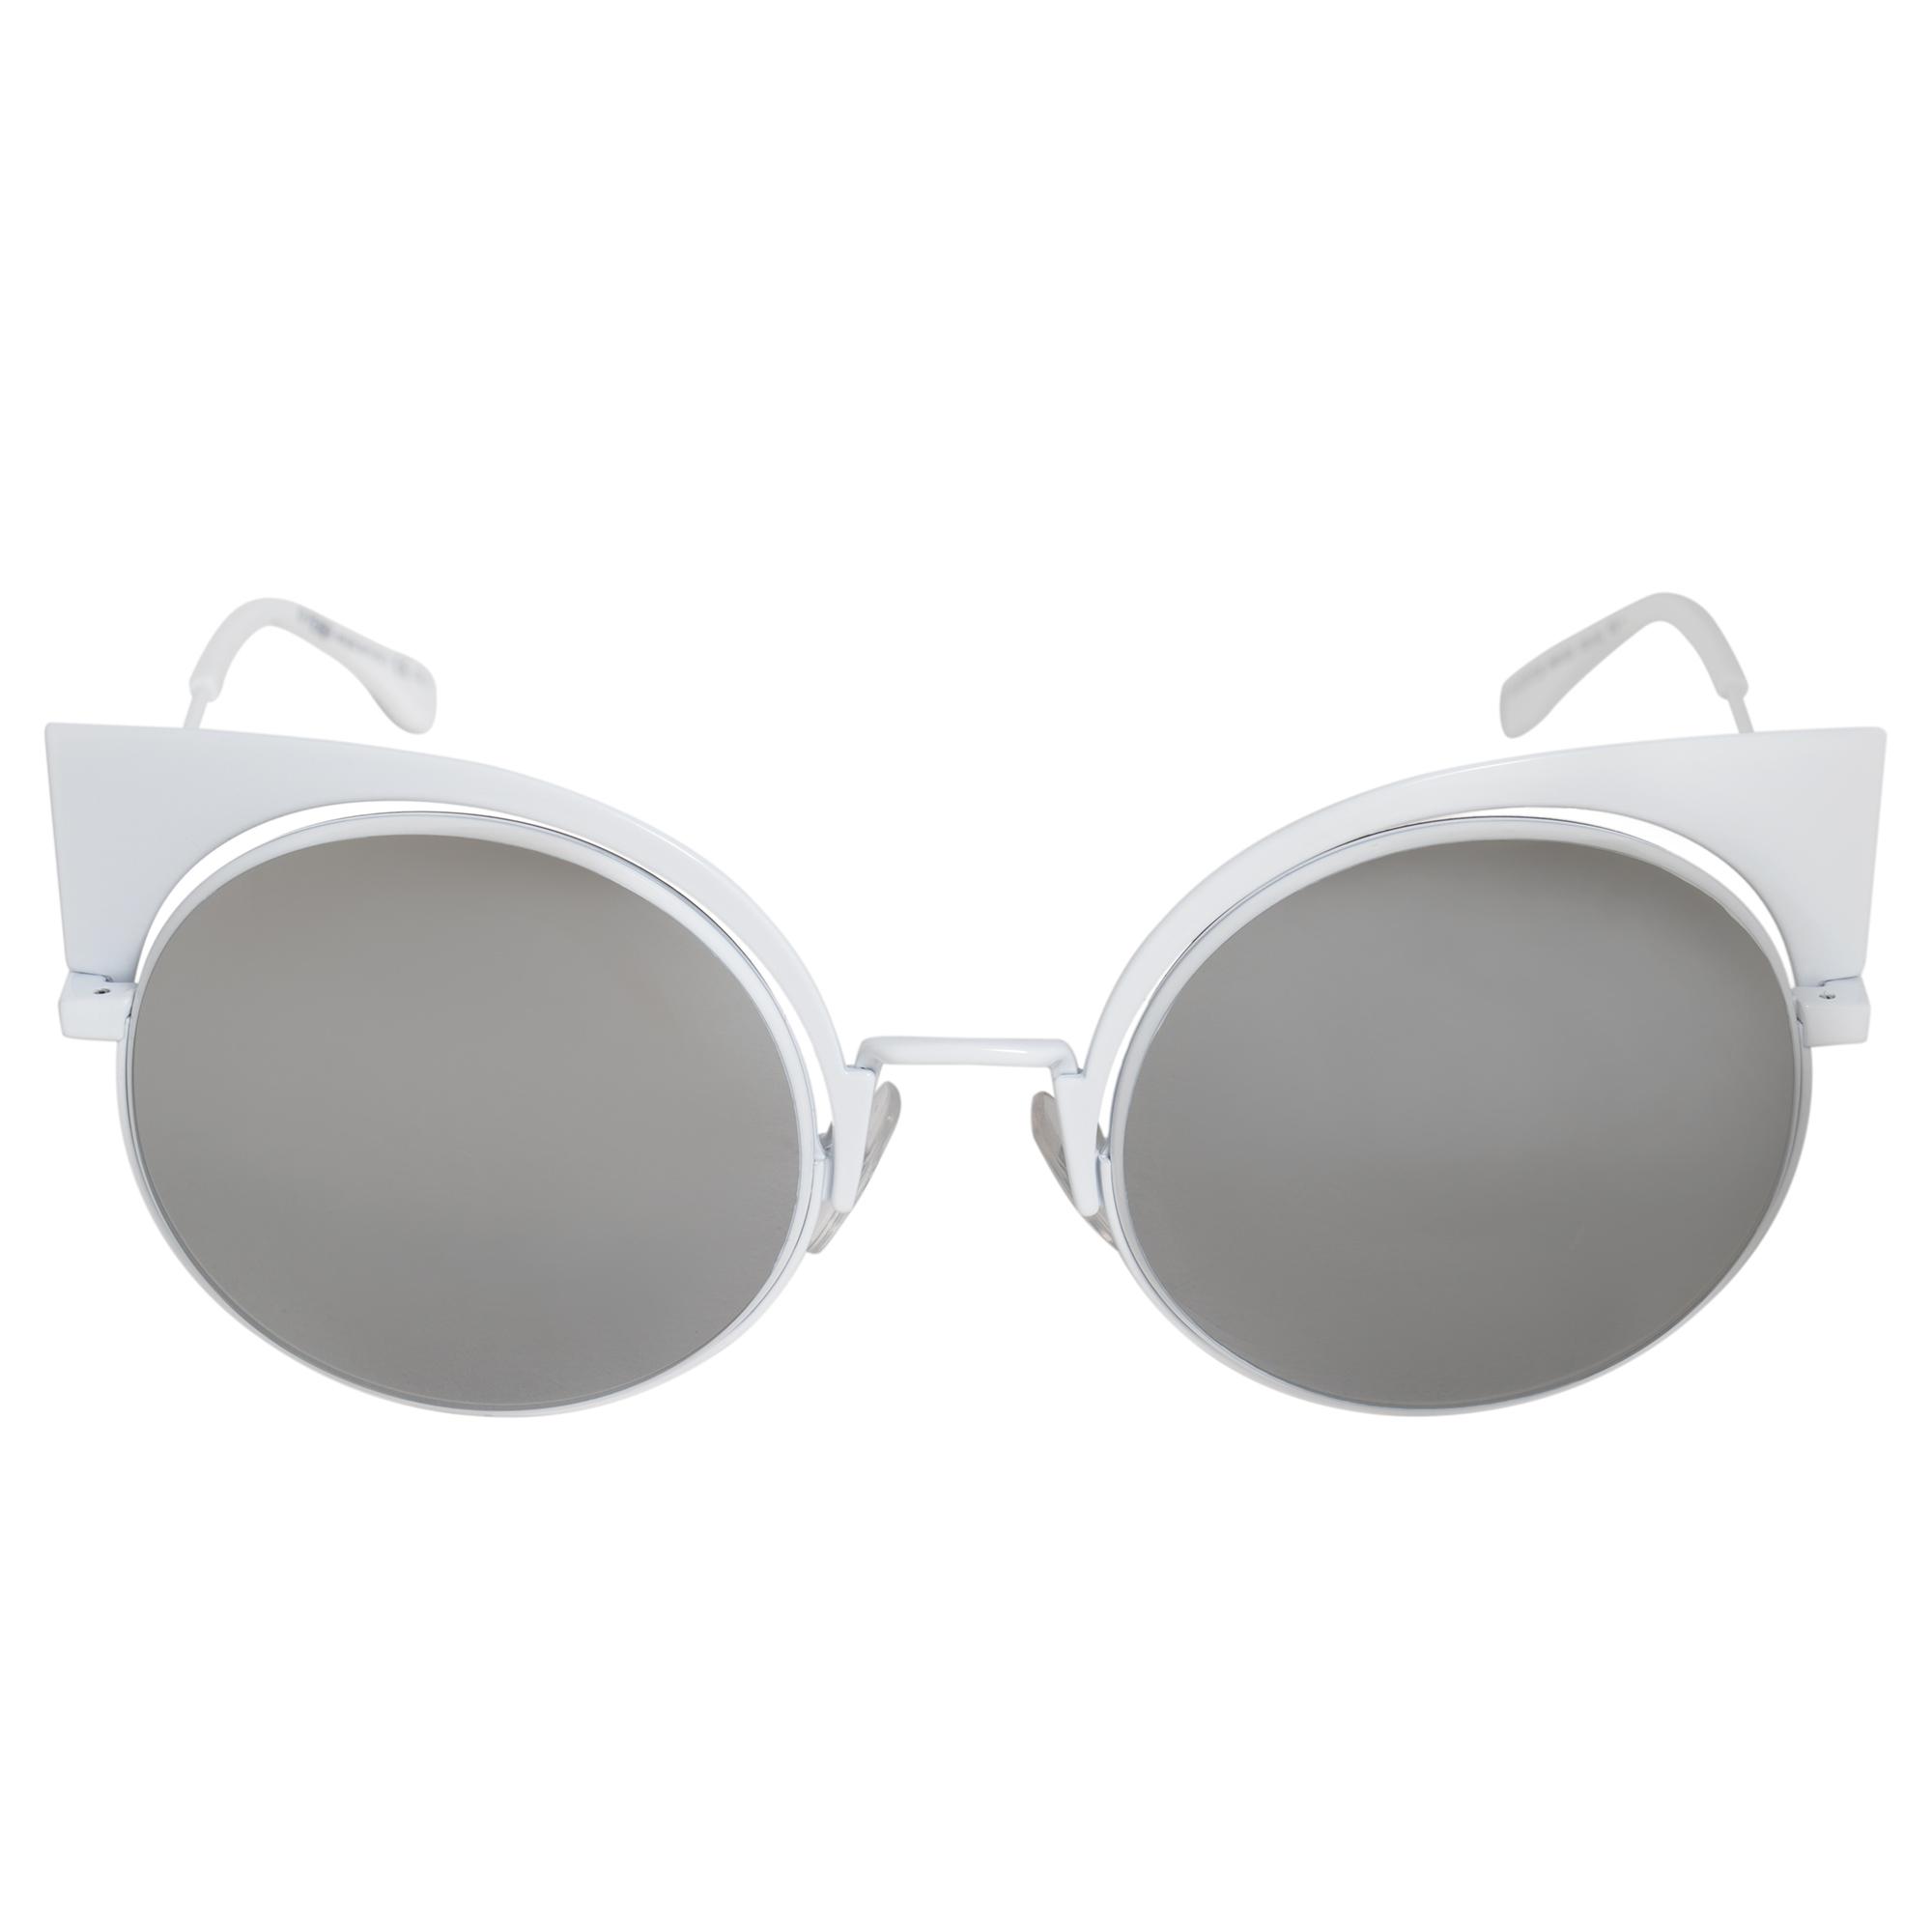 97473d43643 Fendi Eyeshine Cat Eye Sunglasses FF0177S DMV SS 53 762753051516